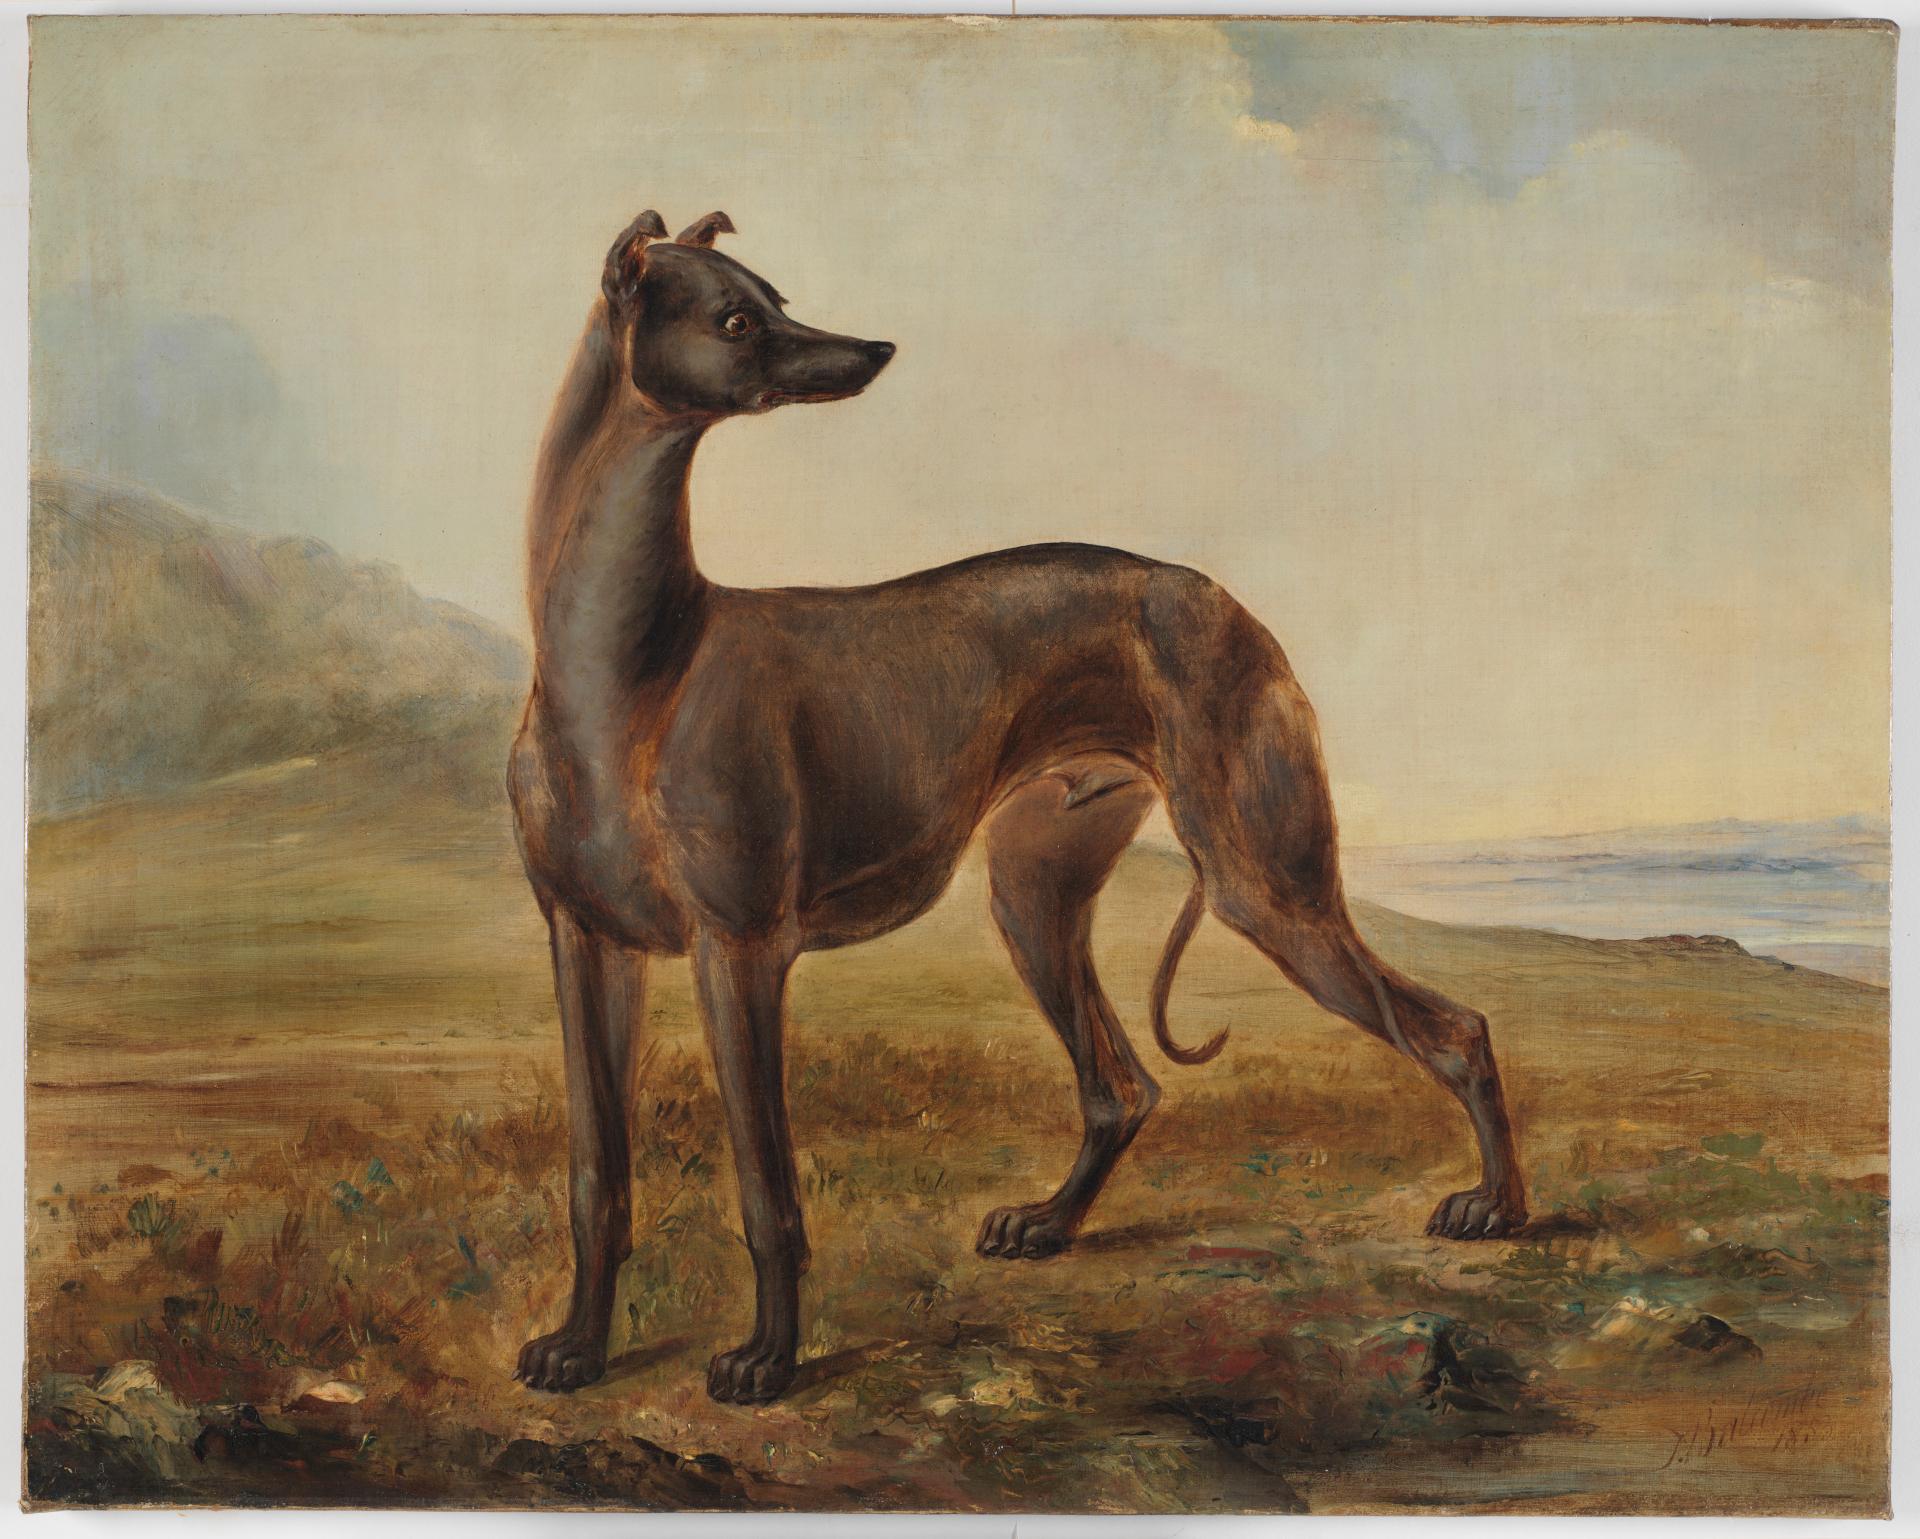 Kangaroo dog owned by Mr Dunn of Castlereagh Street, Sydney, 1853 / painted by Thomas Tyrwhitt Balcombe